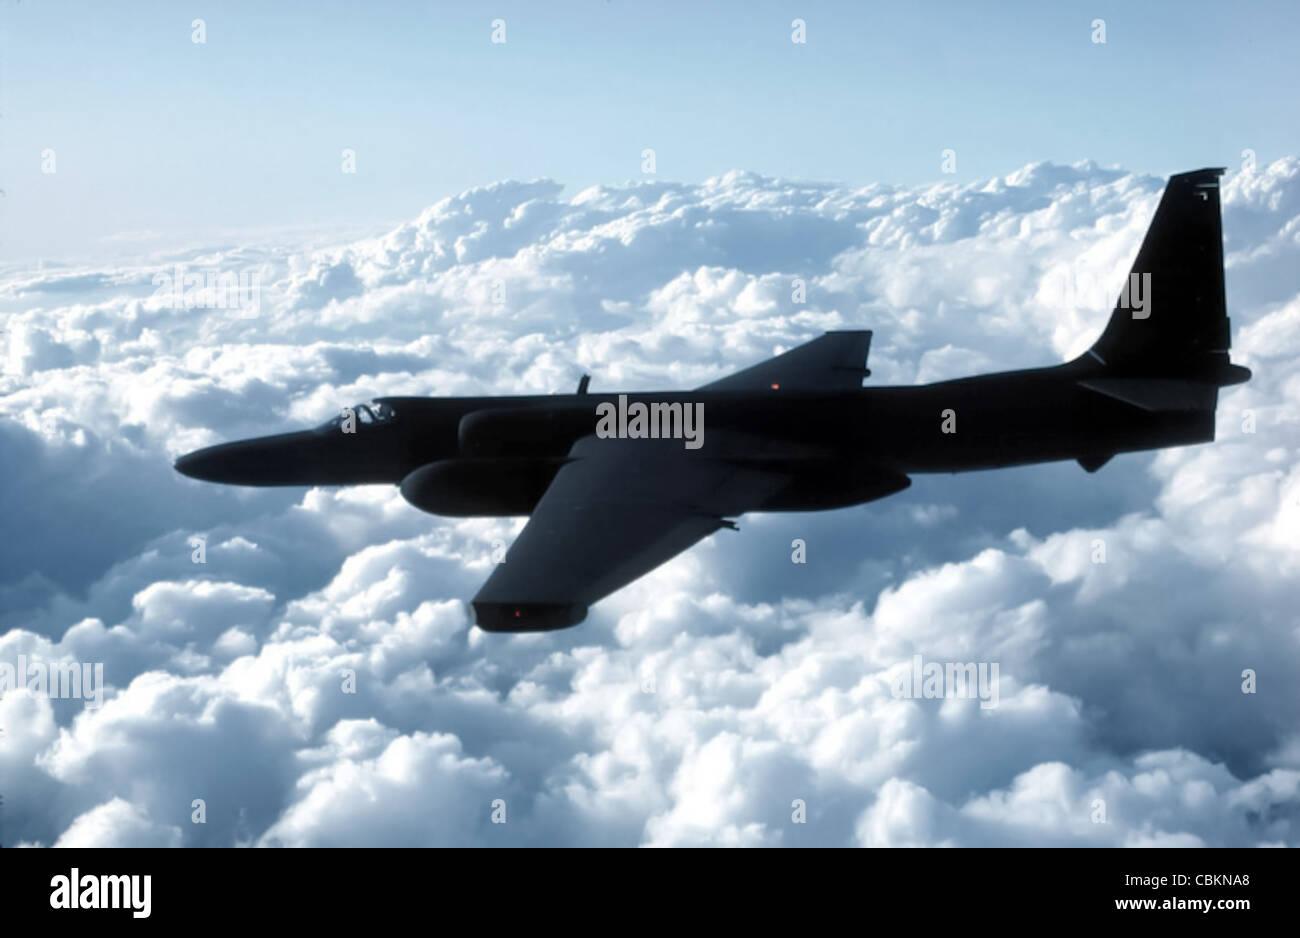 The U-2 Dragon Lady spy plane - Stock Image